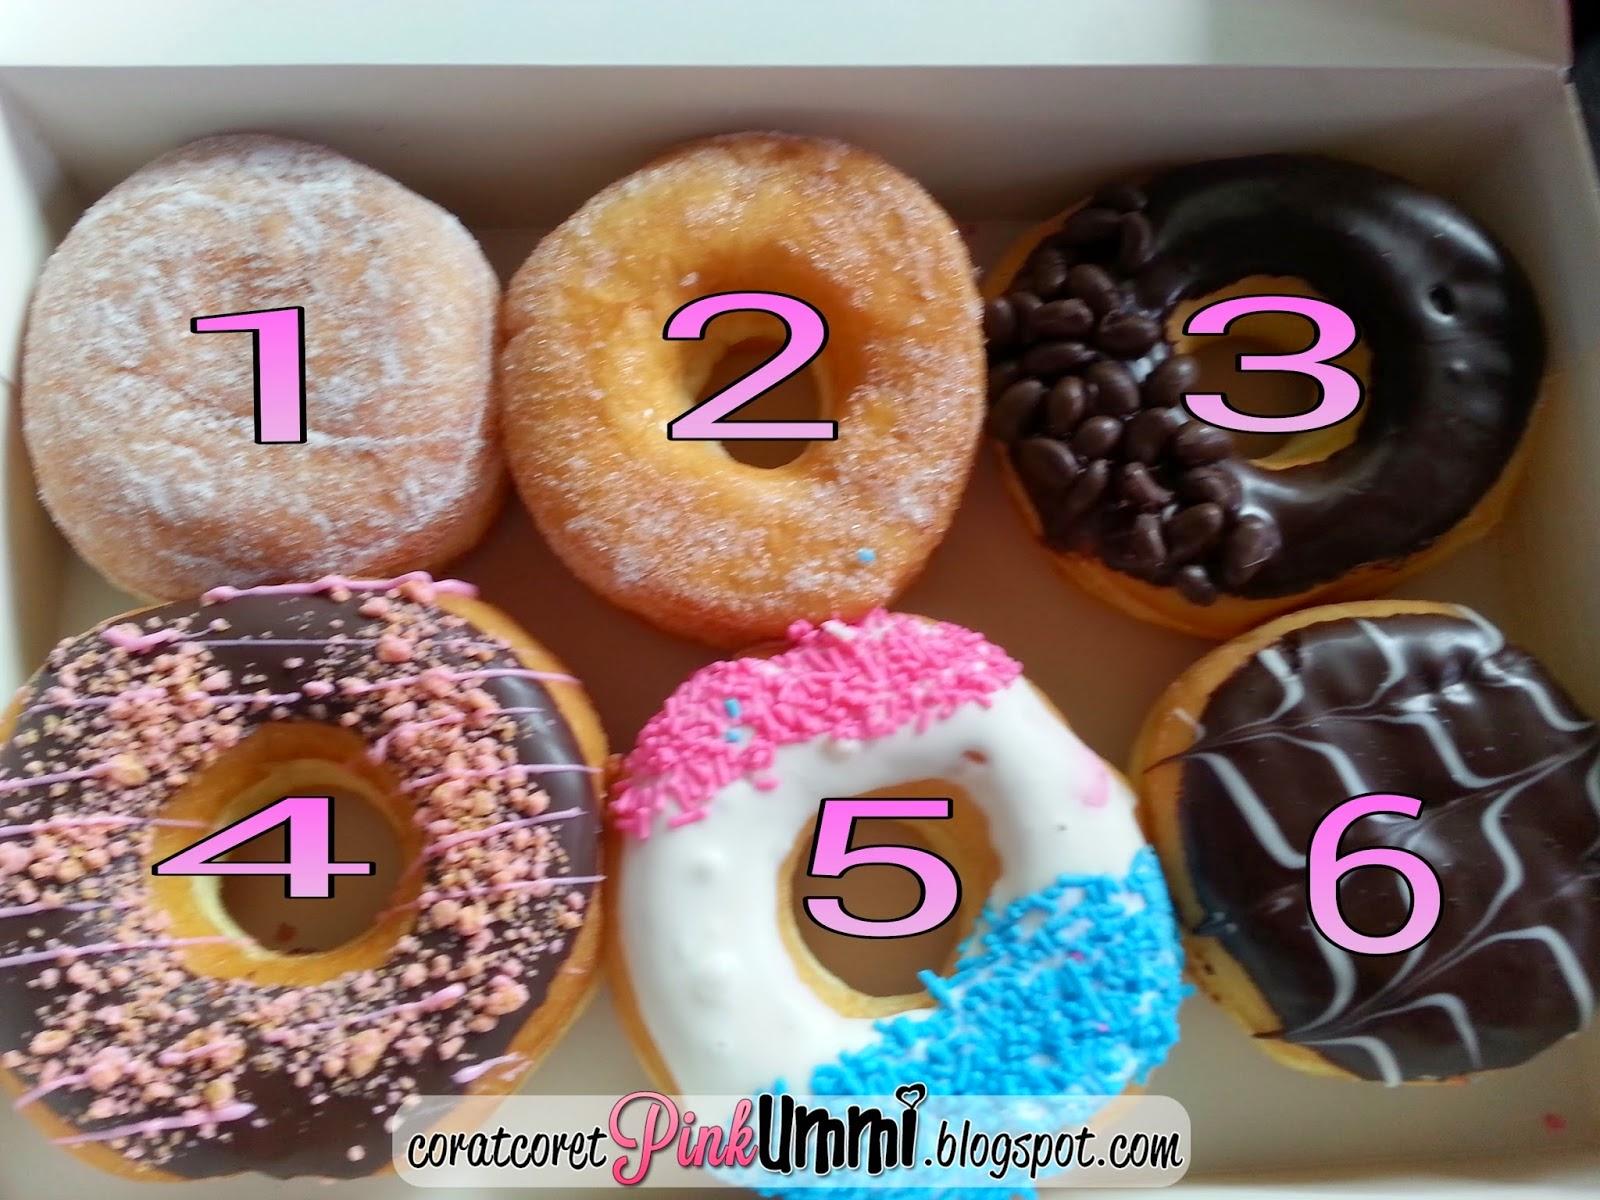 http://coratcoretpinkummi.blogspot.com/2014/07/mini-ga-teka-dunkins-donut.html